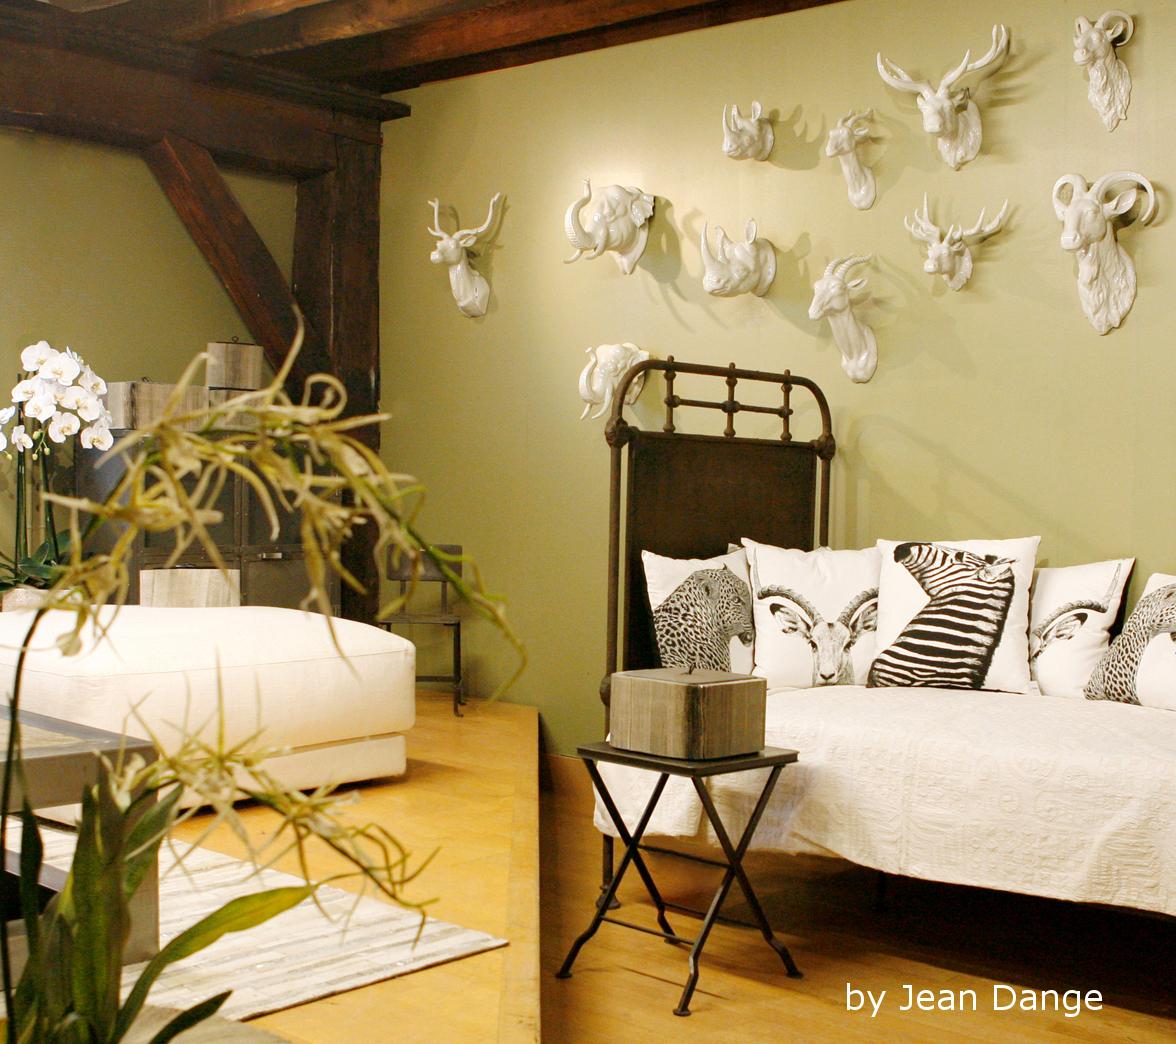 jean dange safary safari. Black Bedroom Furniture Sets. Home Design Ideas